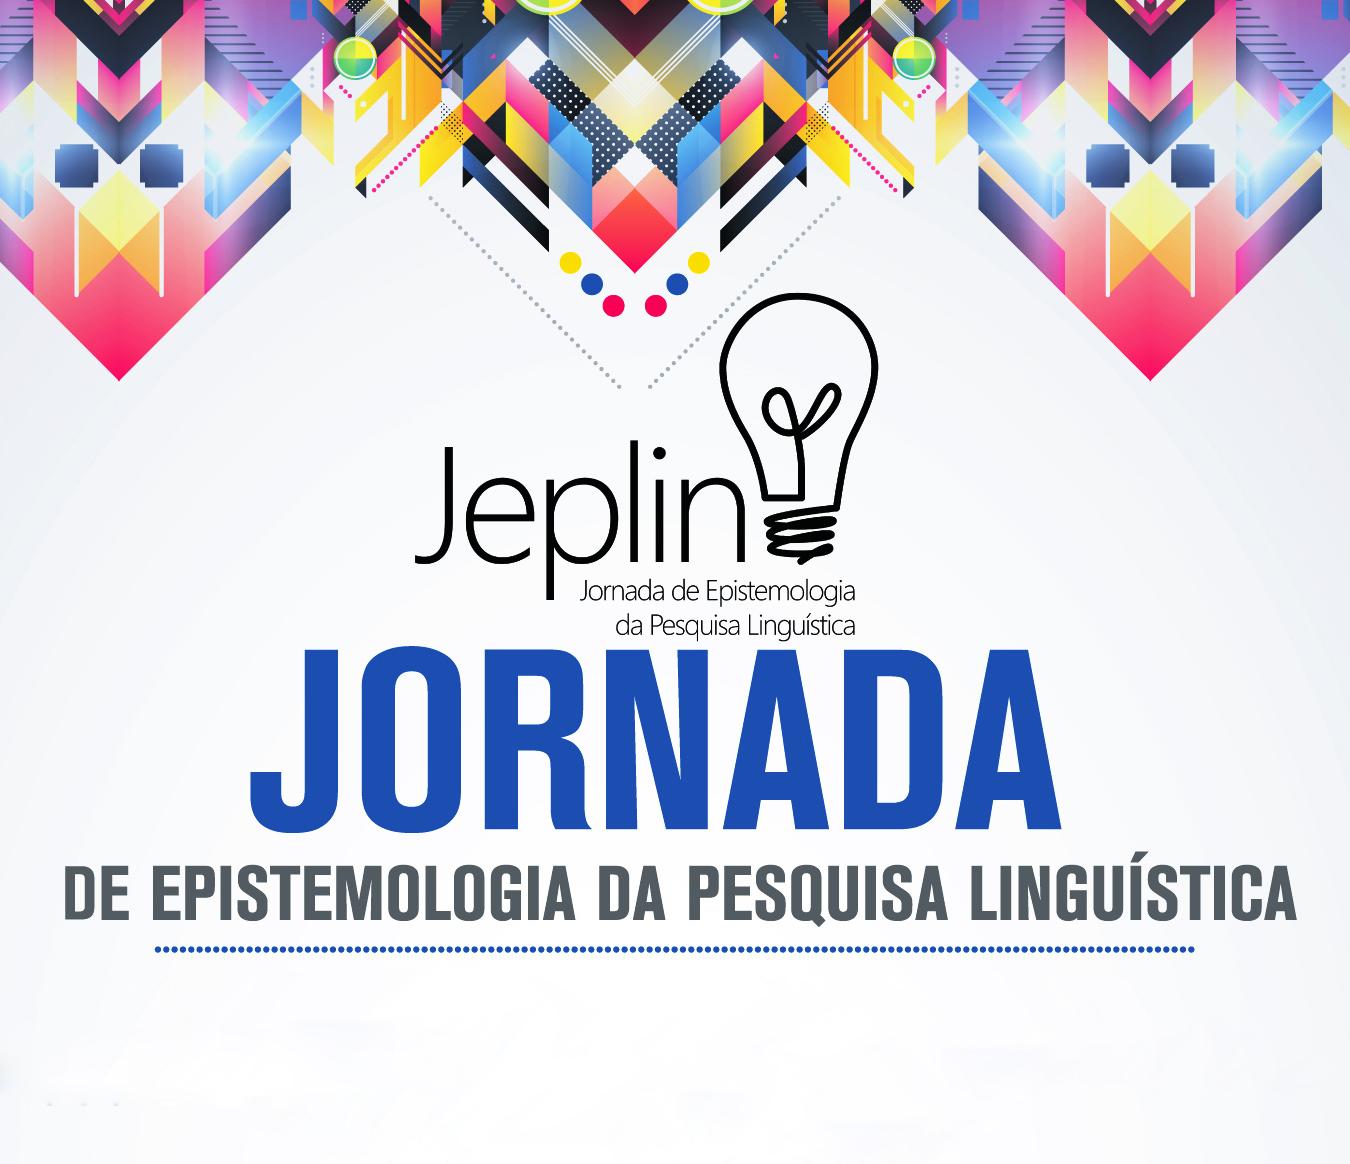 CARTAZ JORNADA ESPISTEMOLÓGICA2